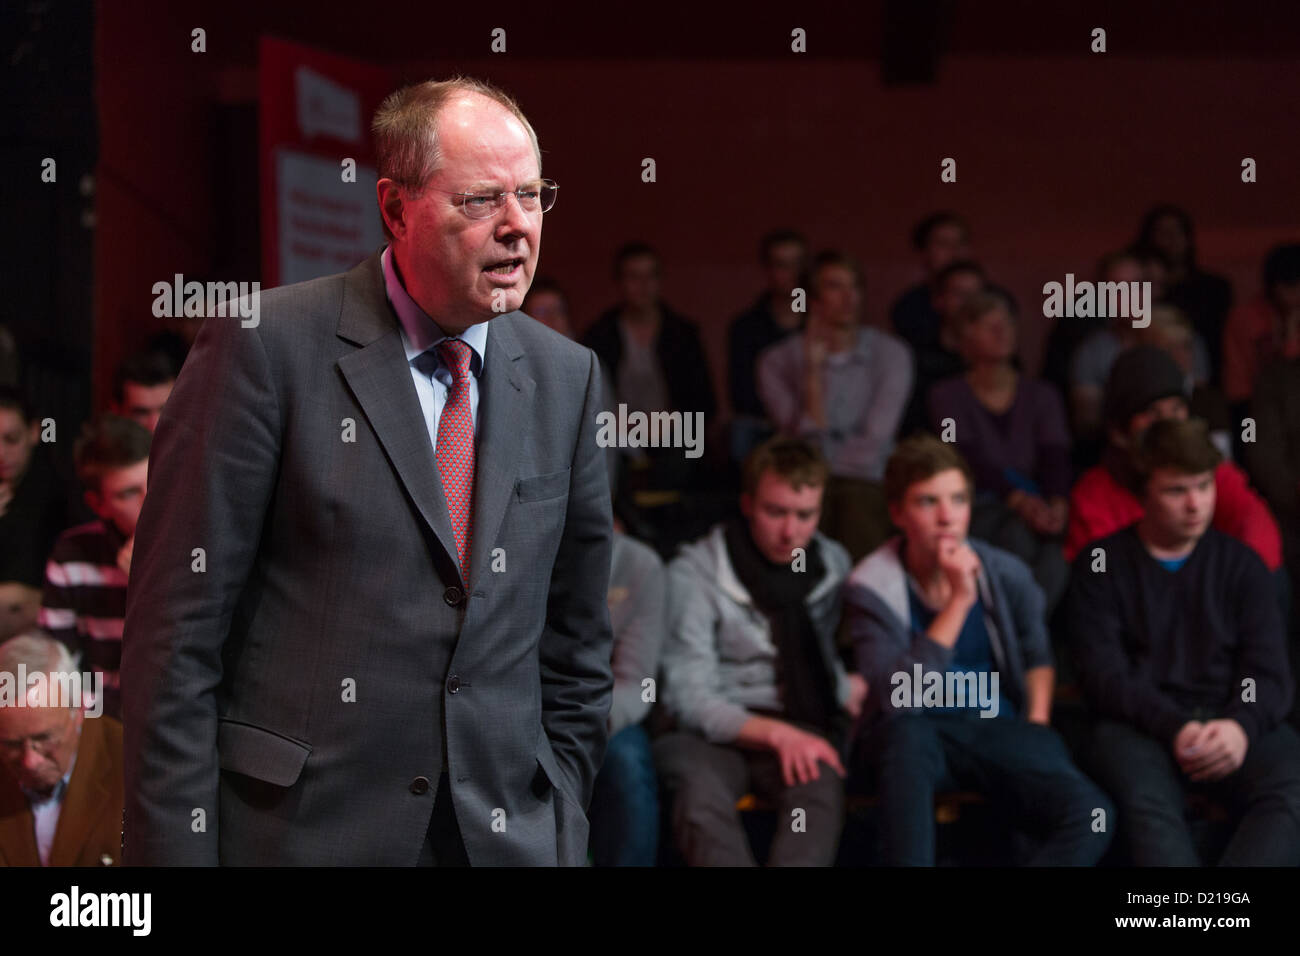 Hamburg, Germany, SPD mayor dialogue with Peer Steinbrueck - Stock Image